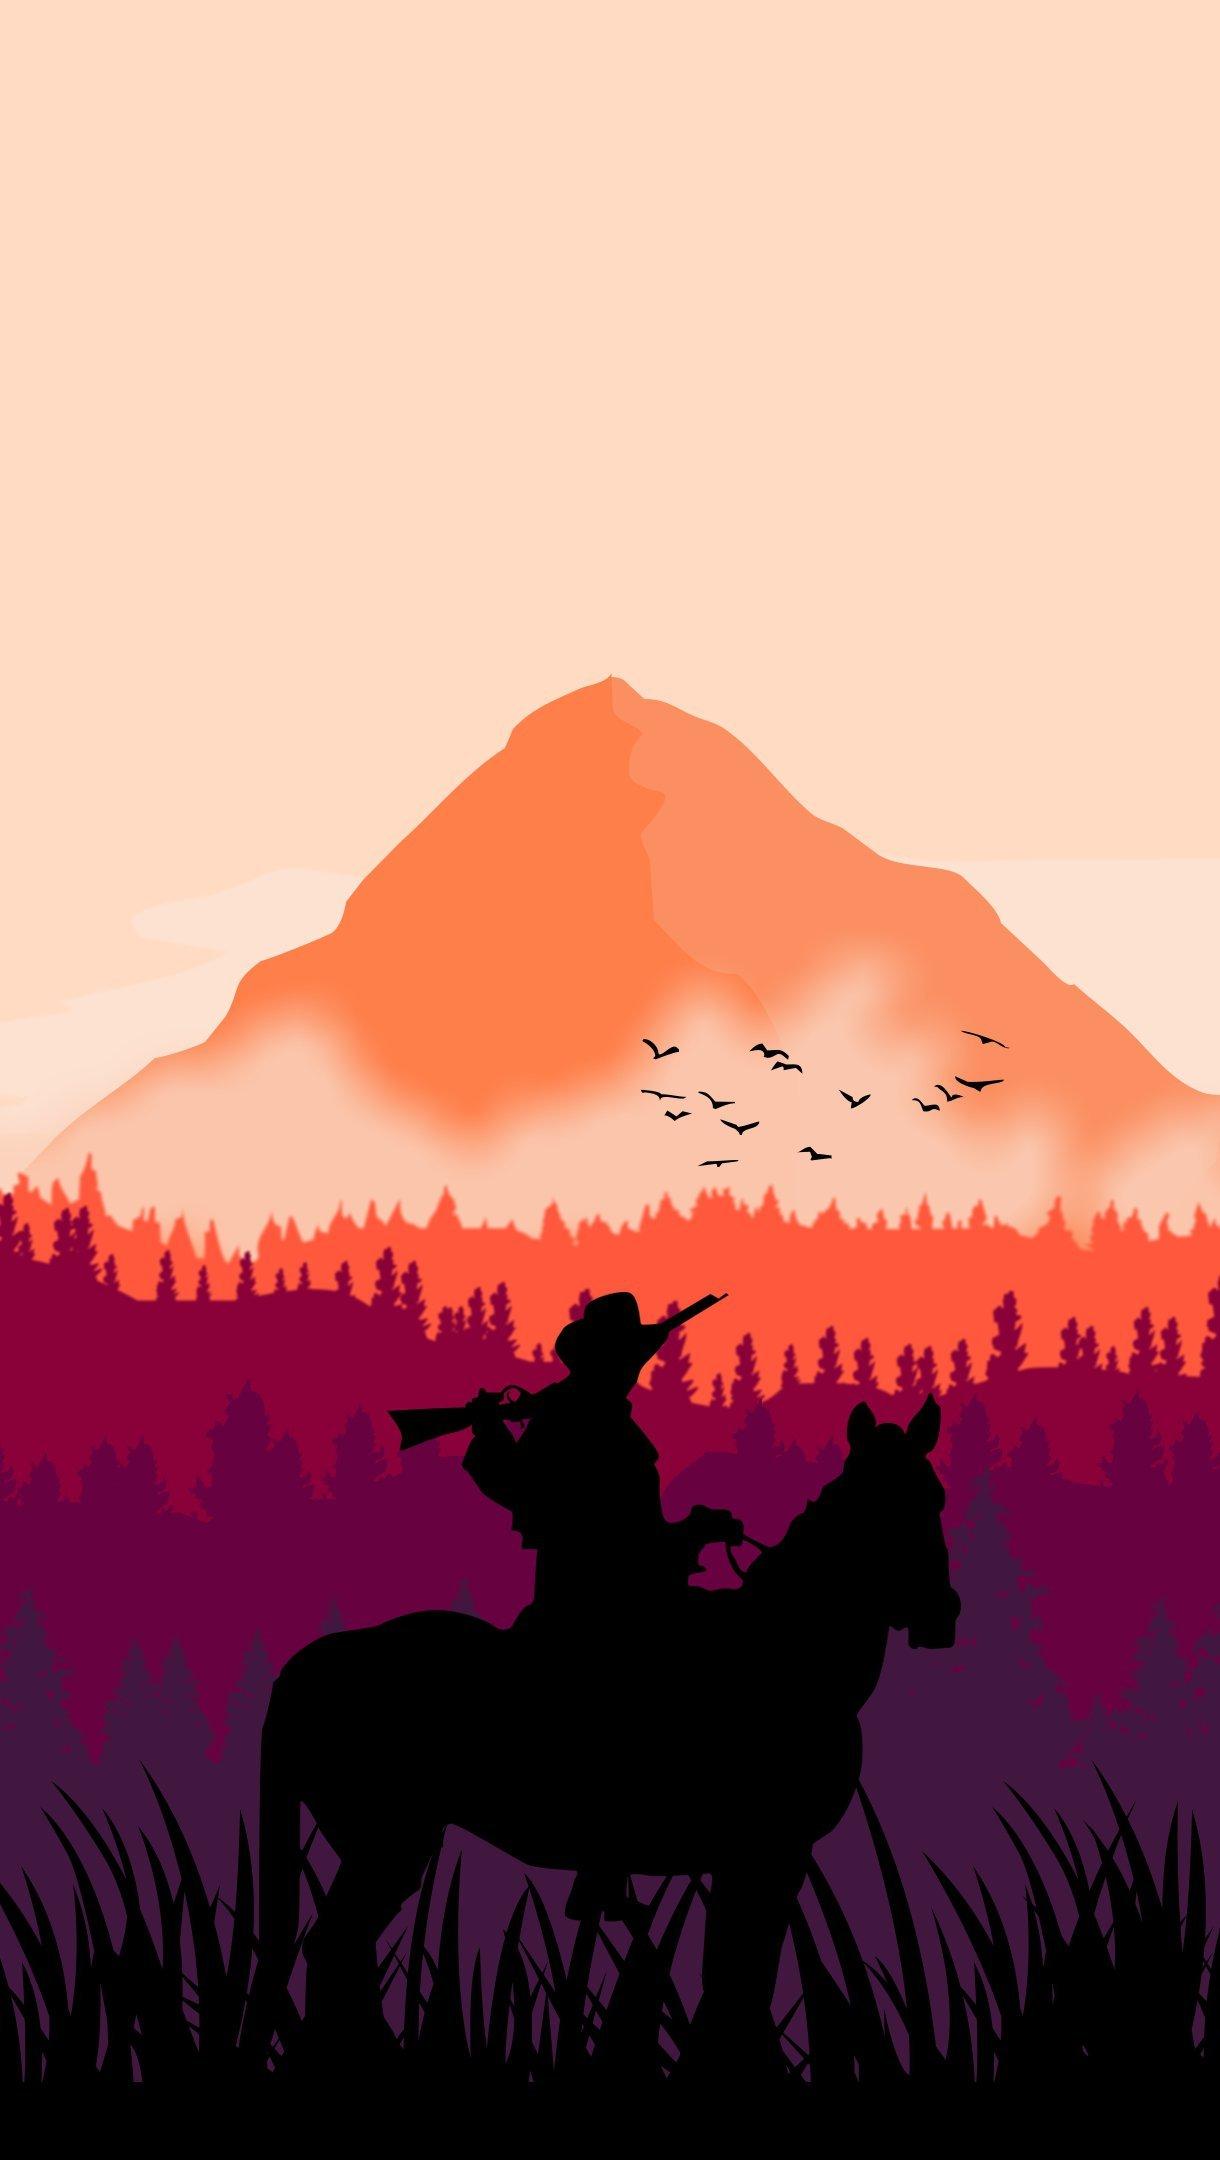 Fondos de pantalla Red Dead Redemption 2 Vertical